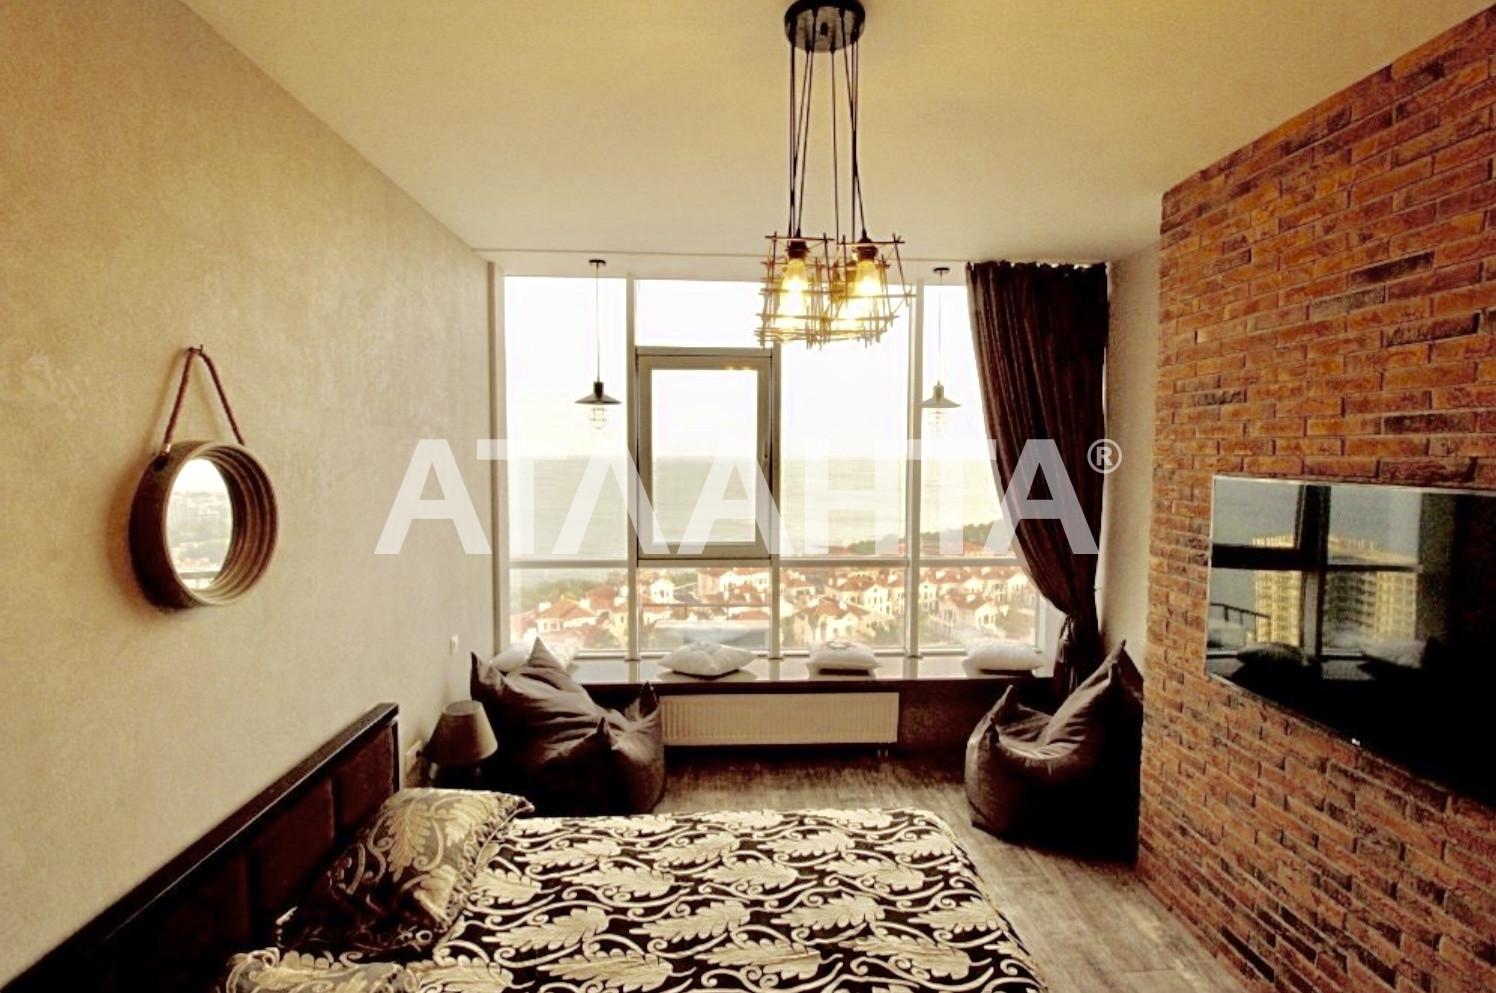 Продается 1-комнатная Квартира на ул. Французский Бул. (Пролетарский Бул.) — 96 000 у.е. (фото №3)